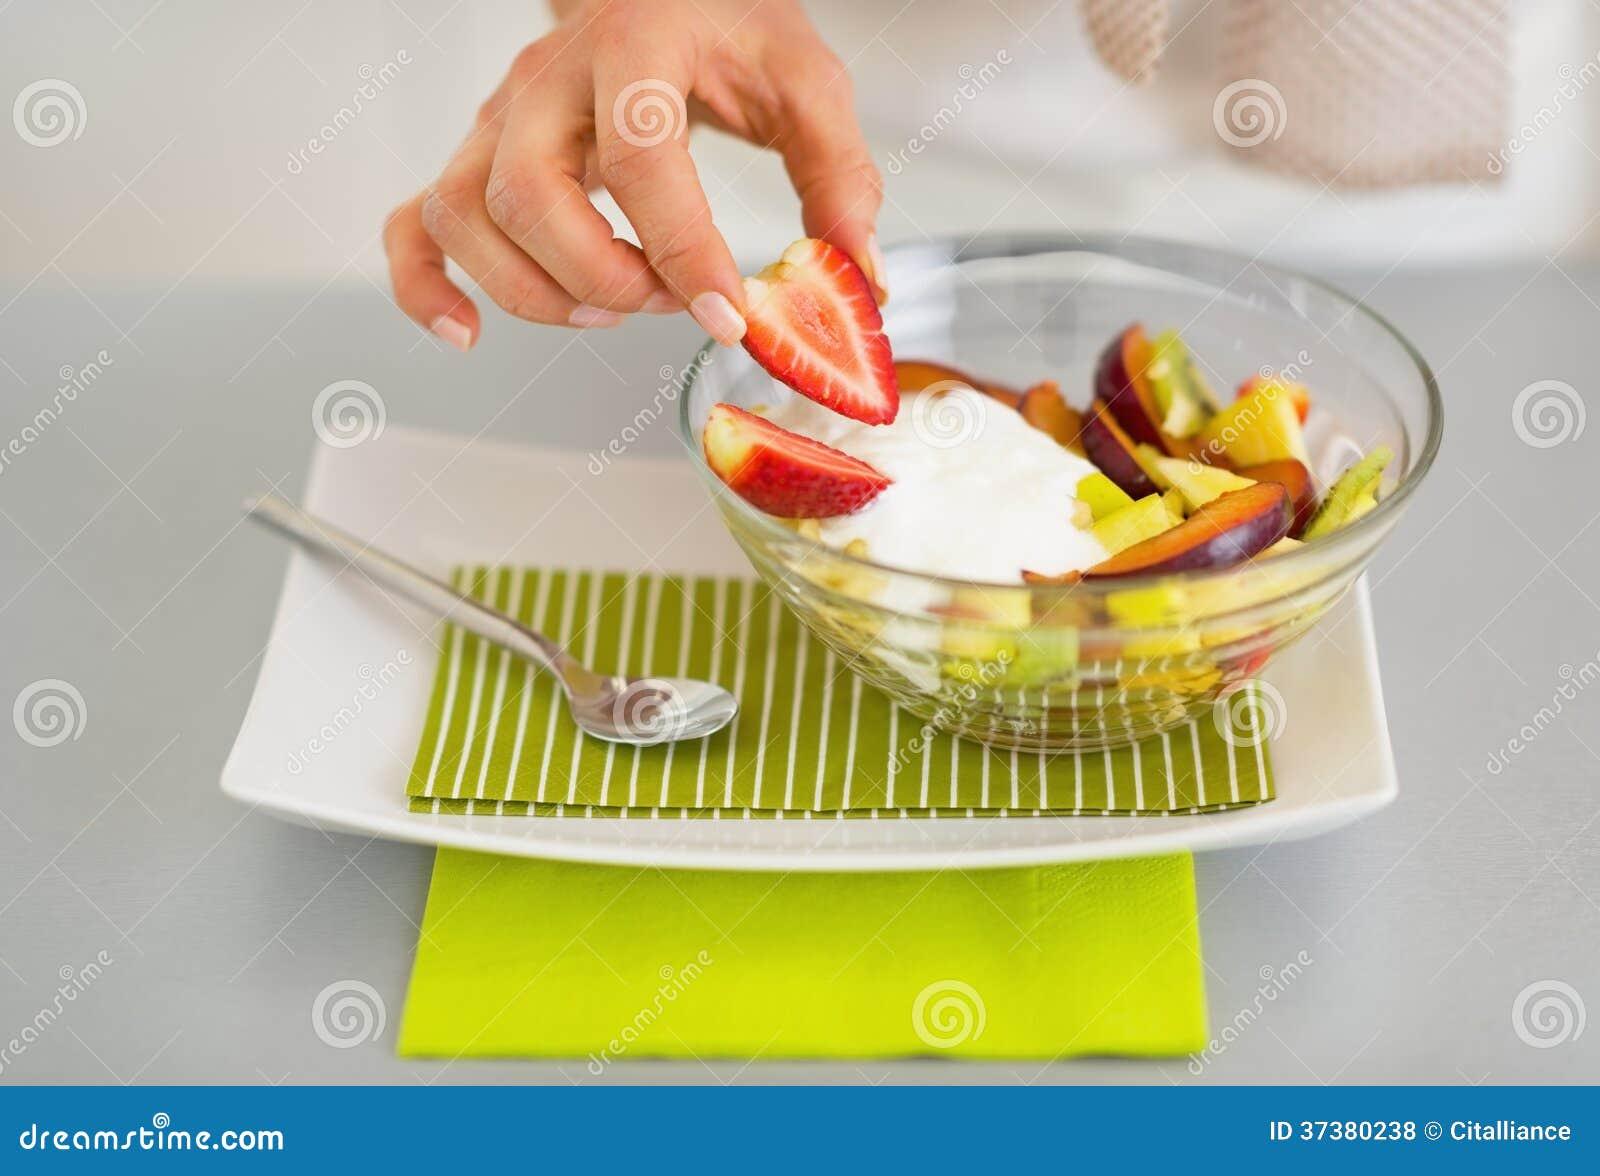 Closeup on woman serving fresh fruit salad